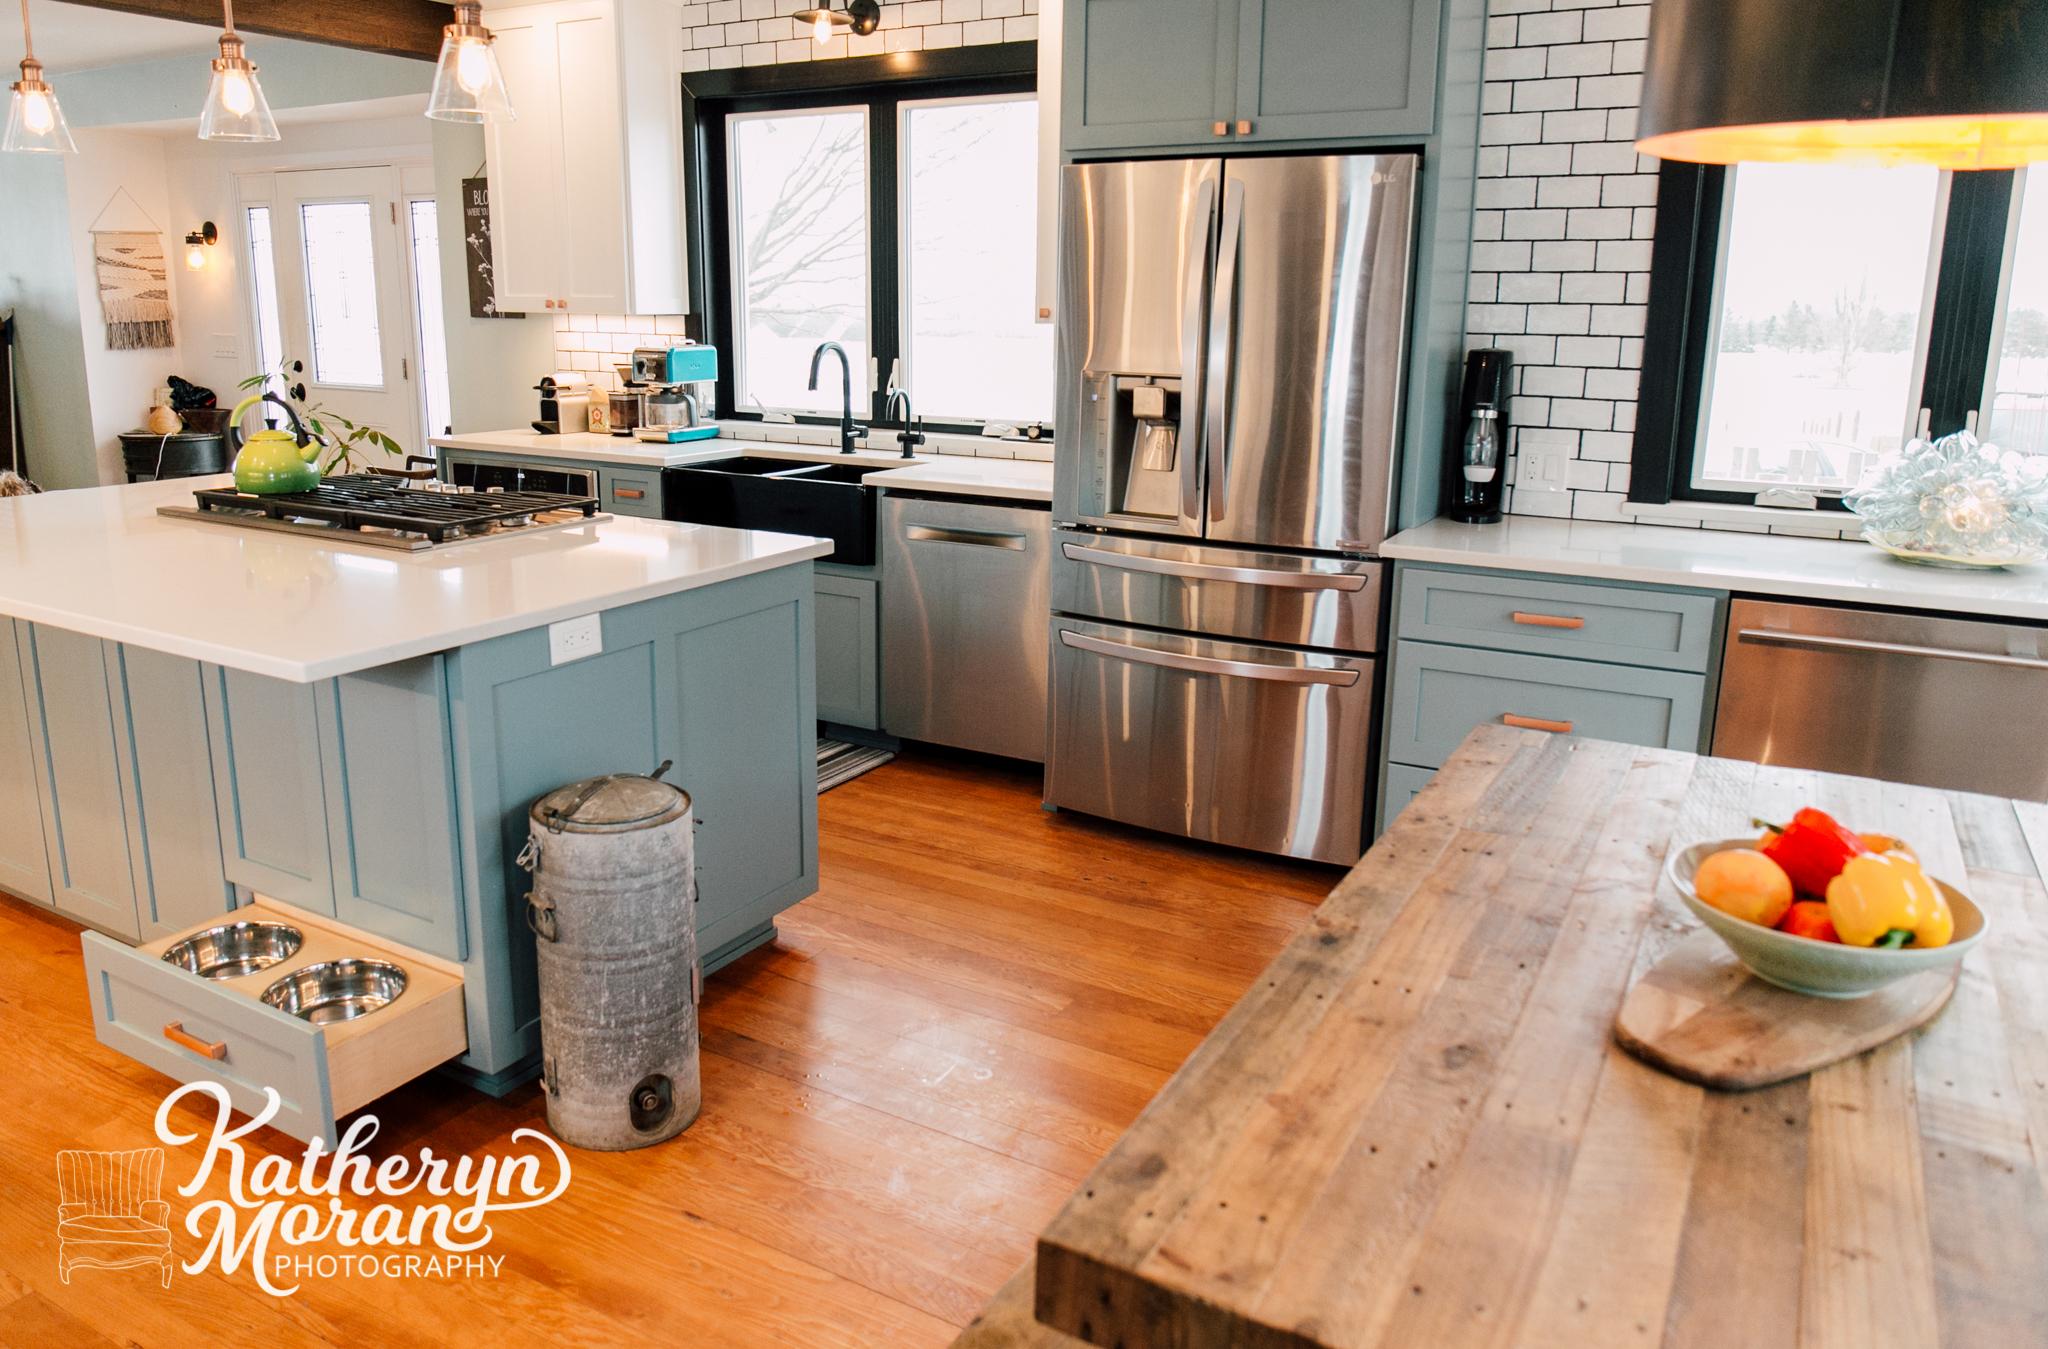 bellingham-photographer-katheryn-moran-jennifer-ryan-designs-interior-design-ferndale-kitchen-2019-1-10.jpg